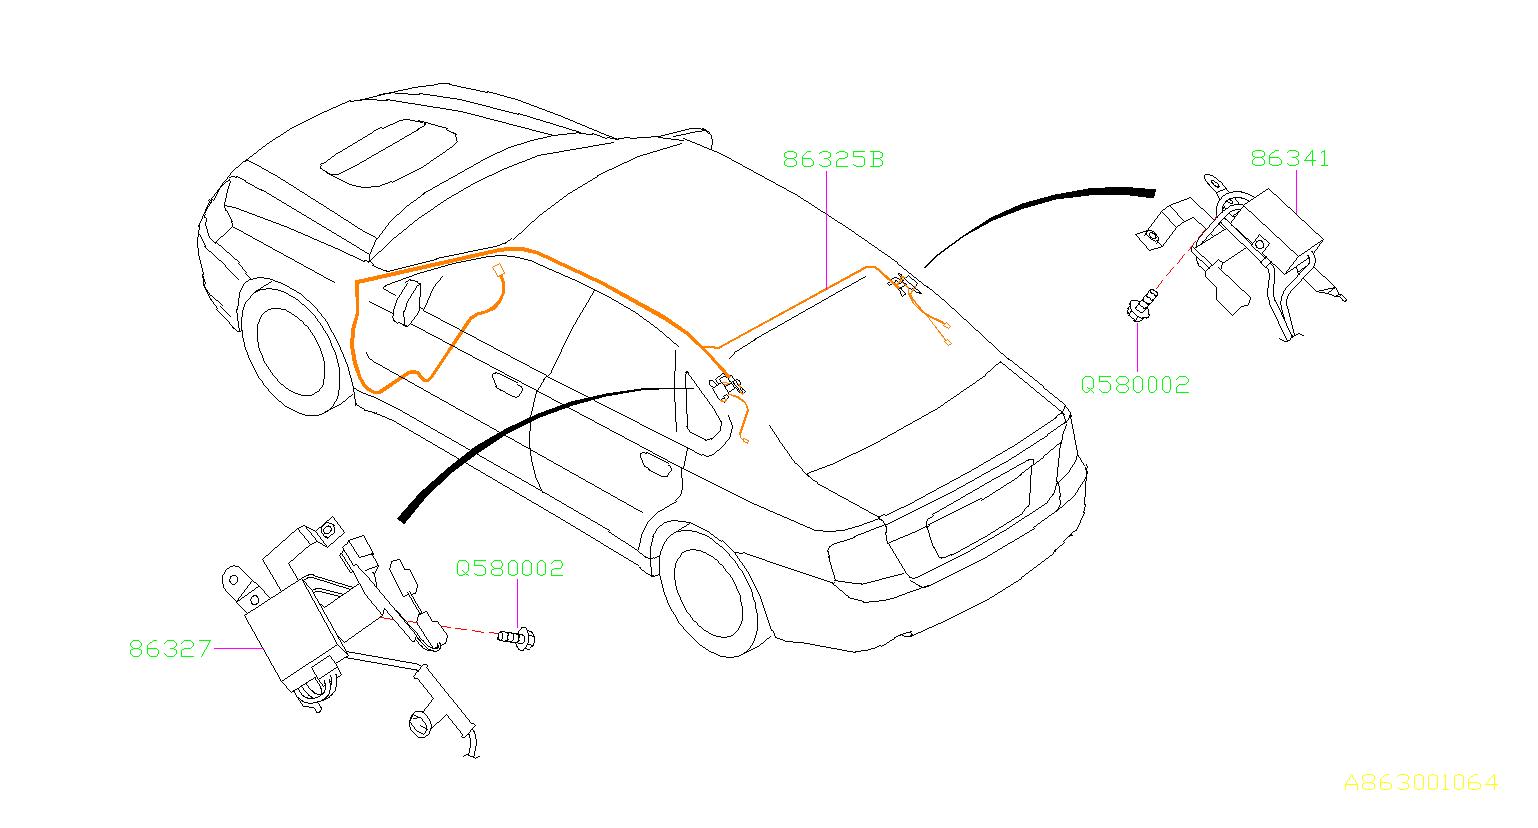 2006 Subaru Outback Cord assembly-antenna feeder